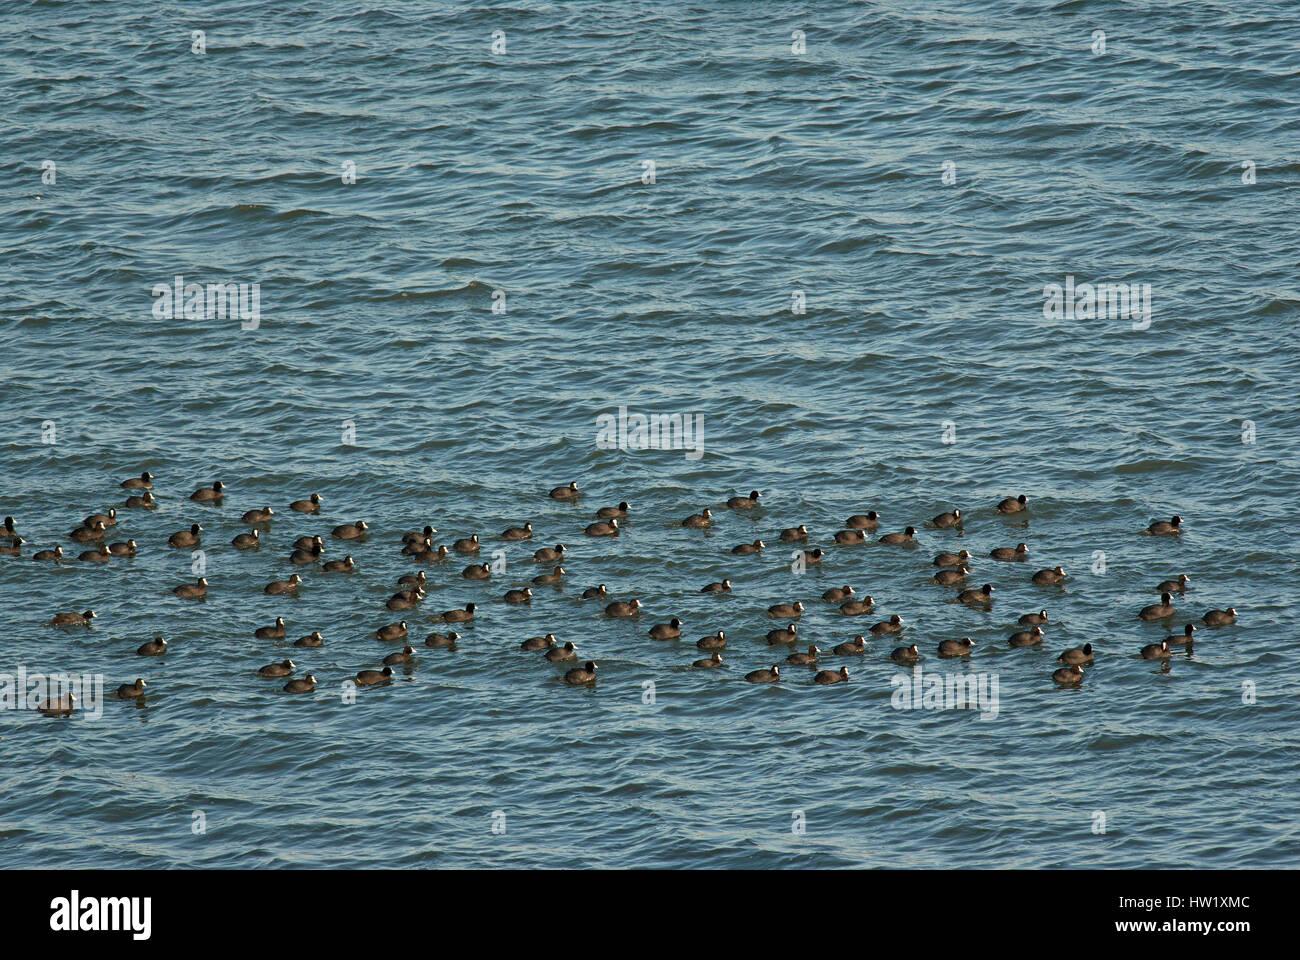 Flock of eurasian coots (Fulica atra), Lake Trasimeno, Umbria, Italy, Europe - Stock Image